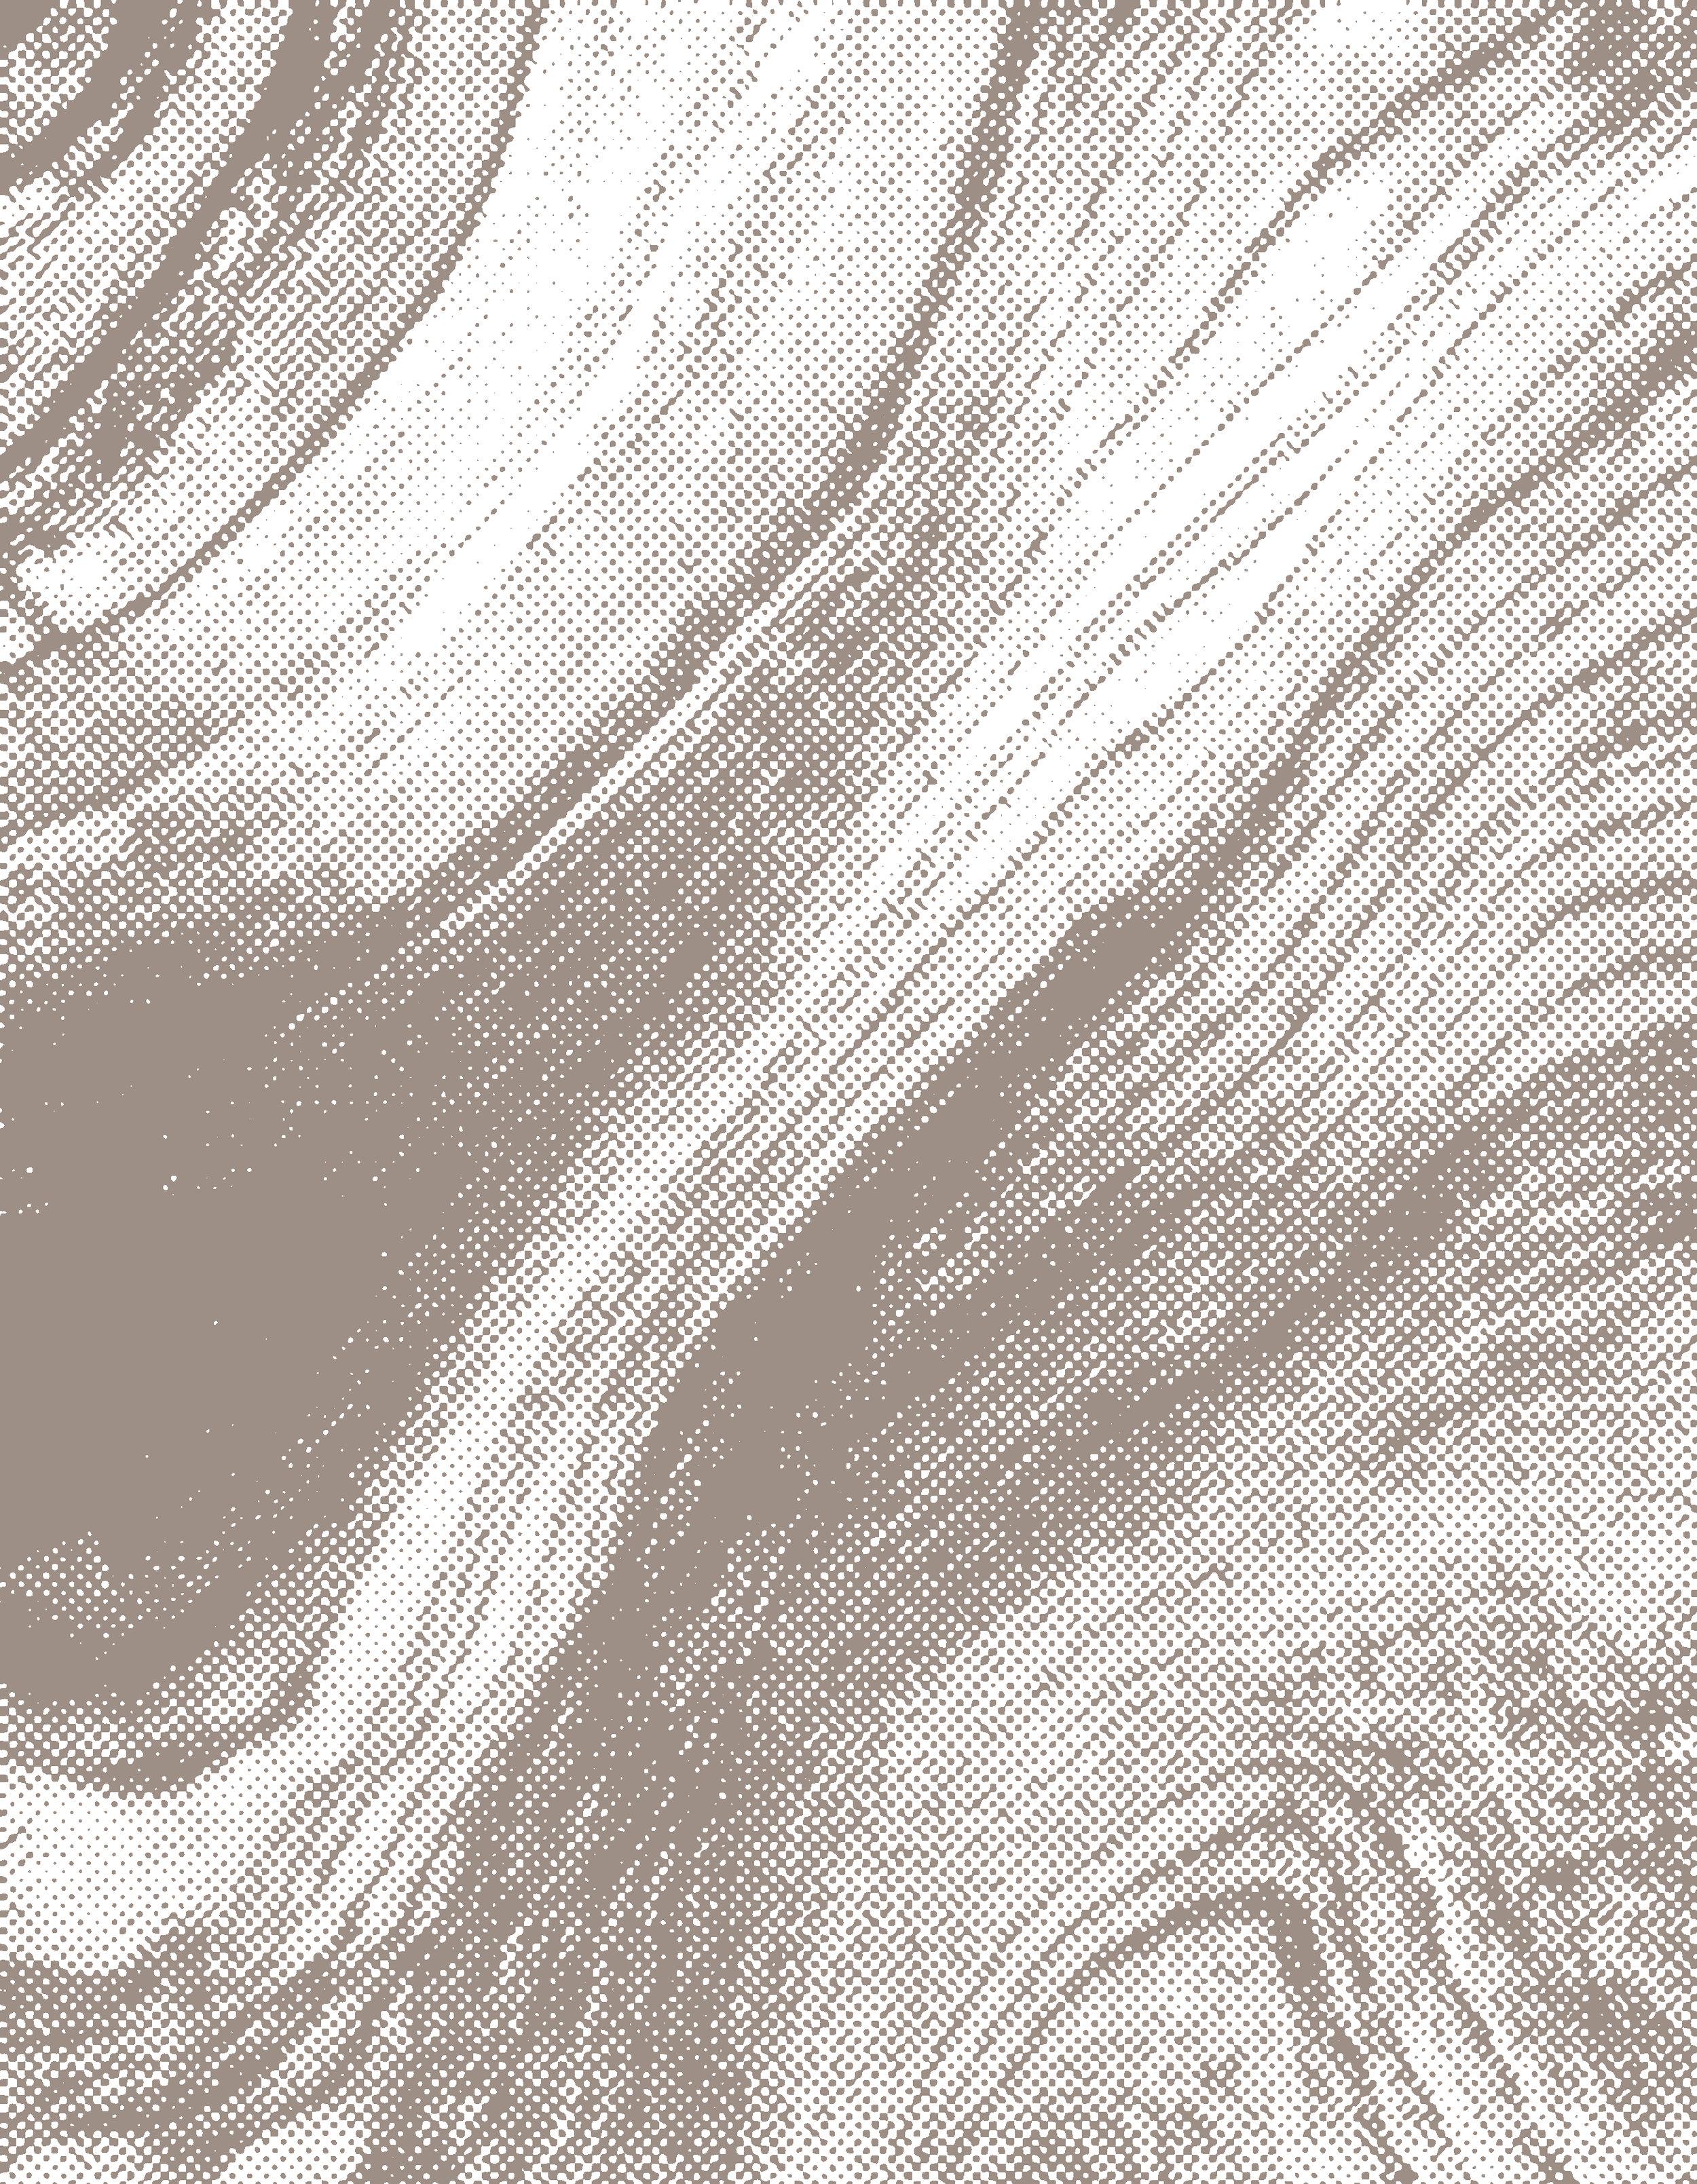 wood_halftone-2.jpg